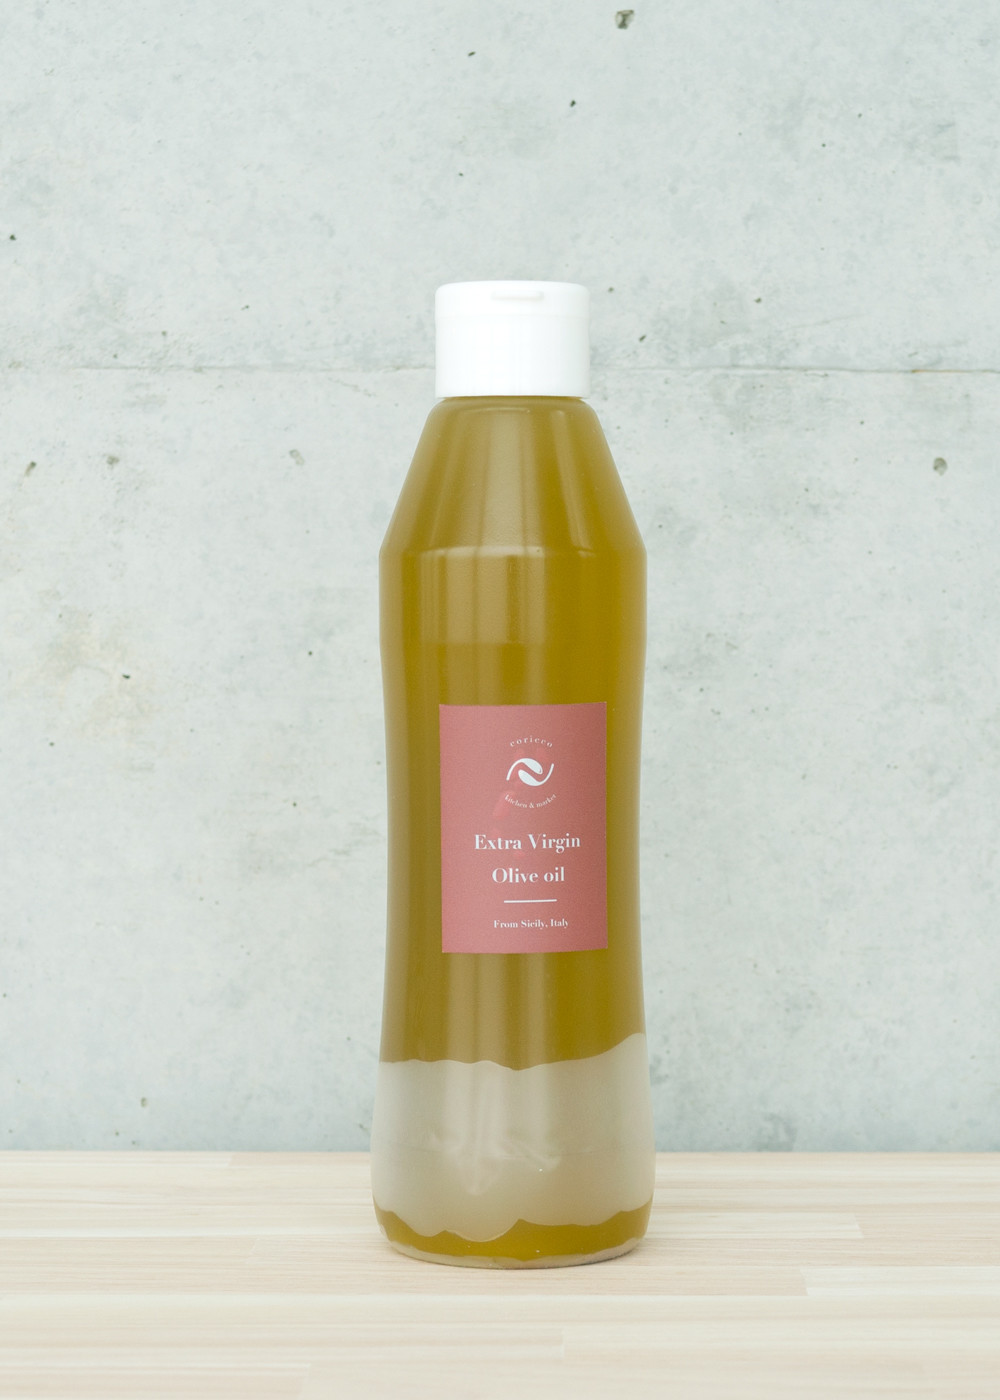 coricco Extra Virgin Olive Oil 500ml 3本セット